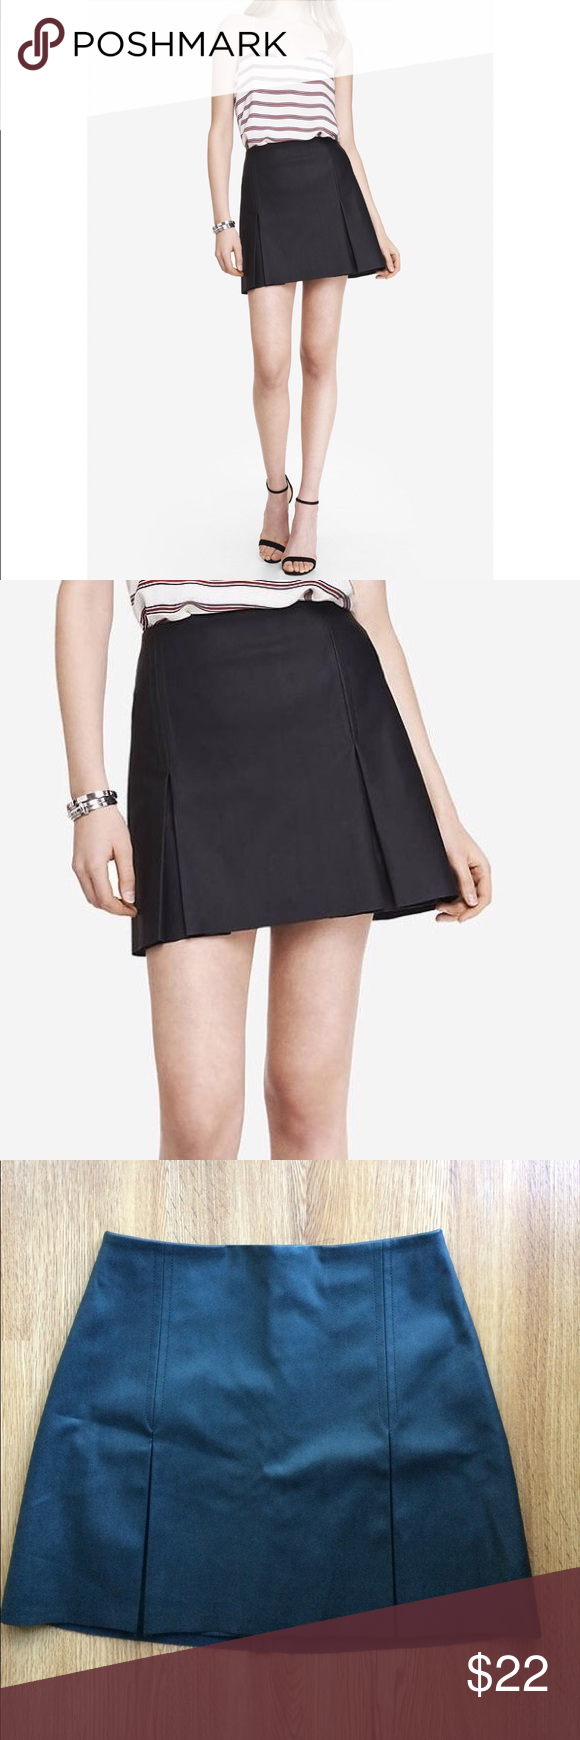 f6a17882b Express faux leather skirt mini vegan pleated 4 Like new Express mini skirt  a-line pleated front. Back zipper. Classic black. Waist 28